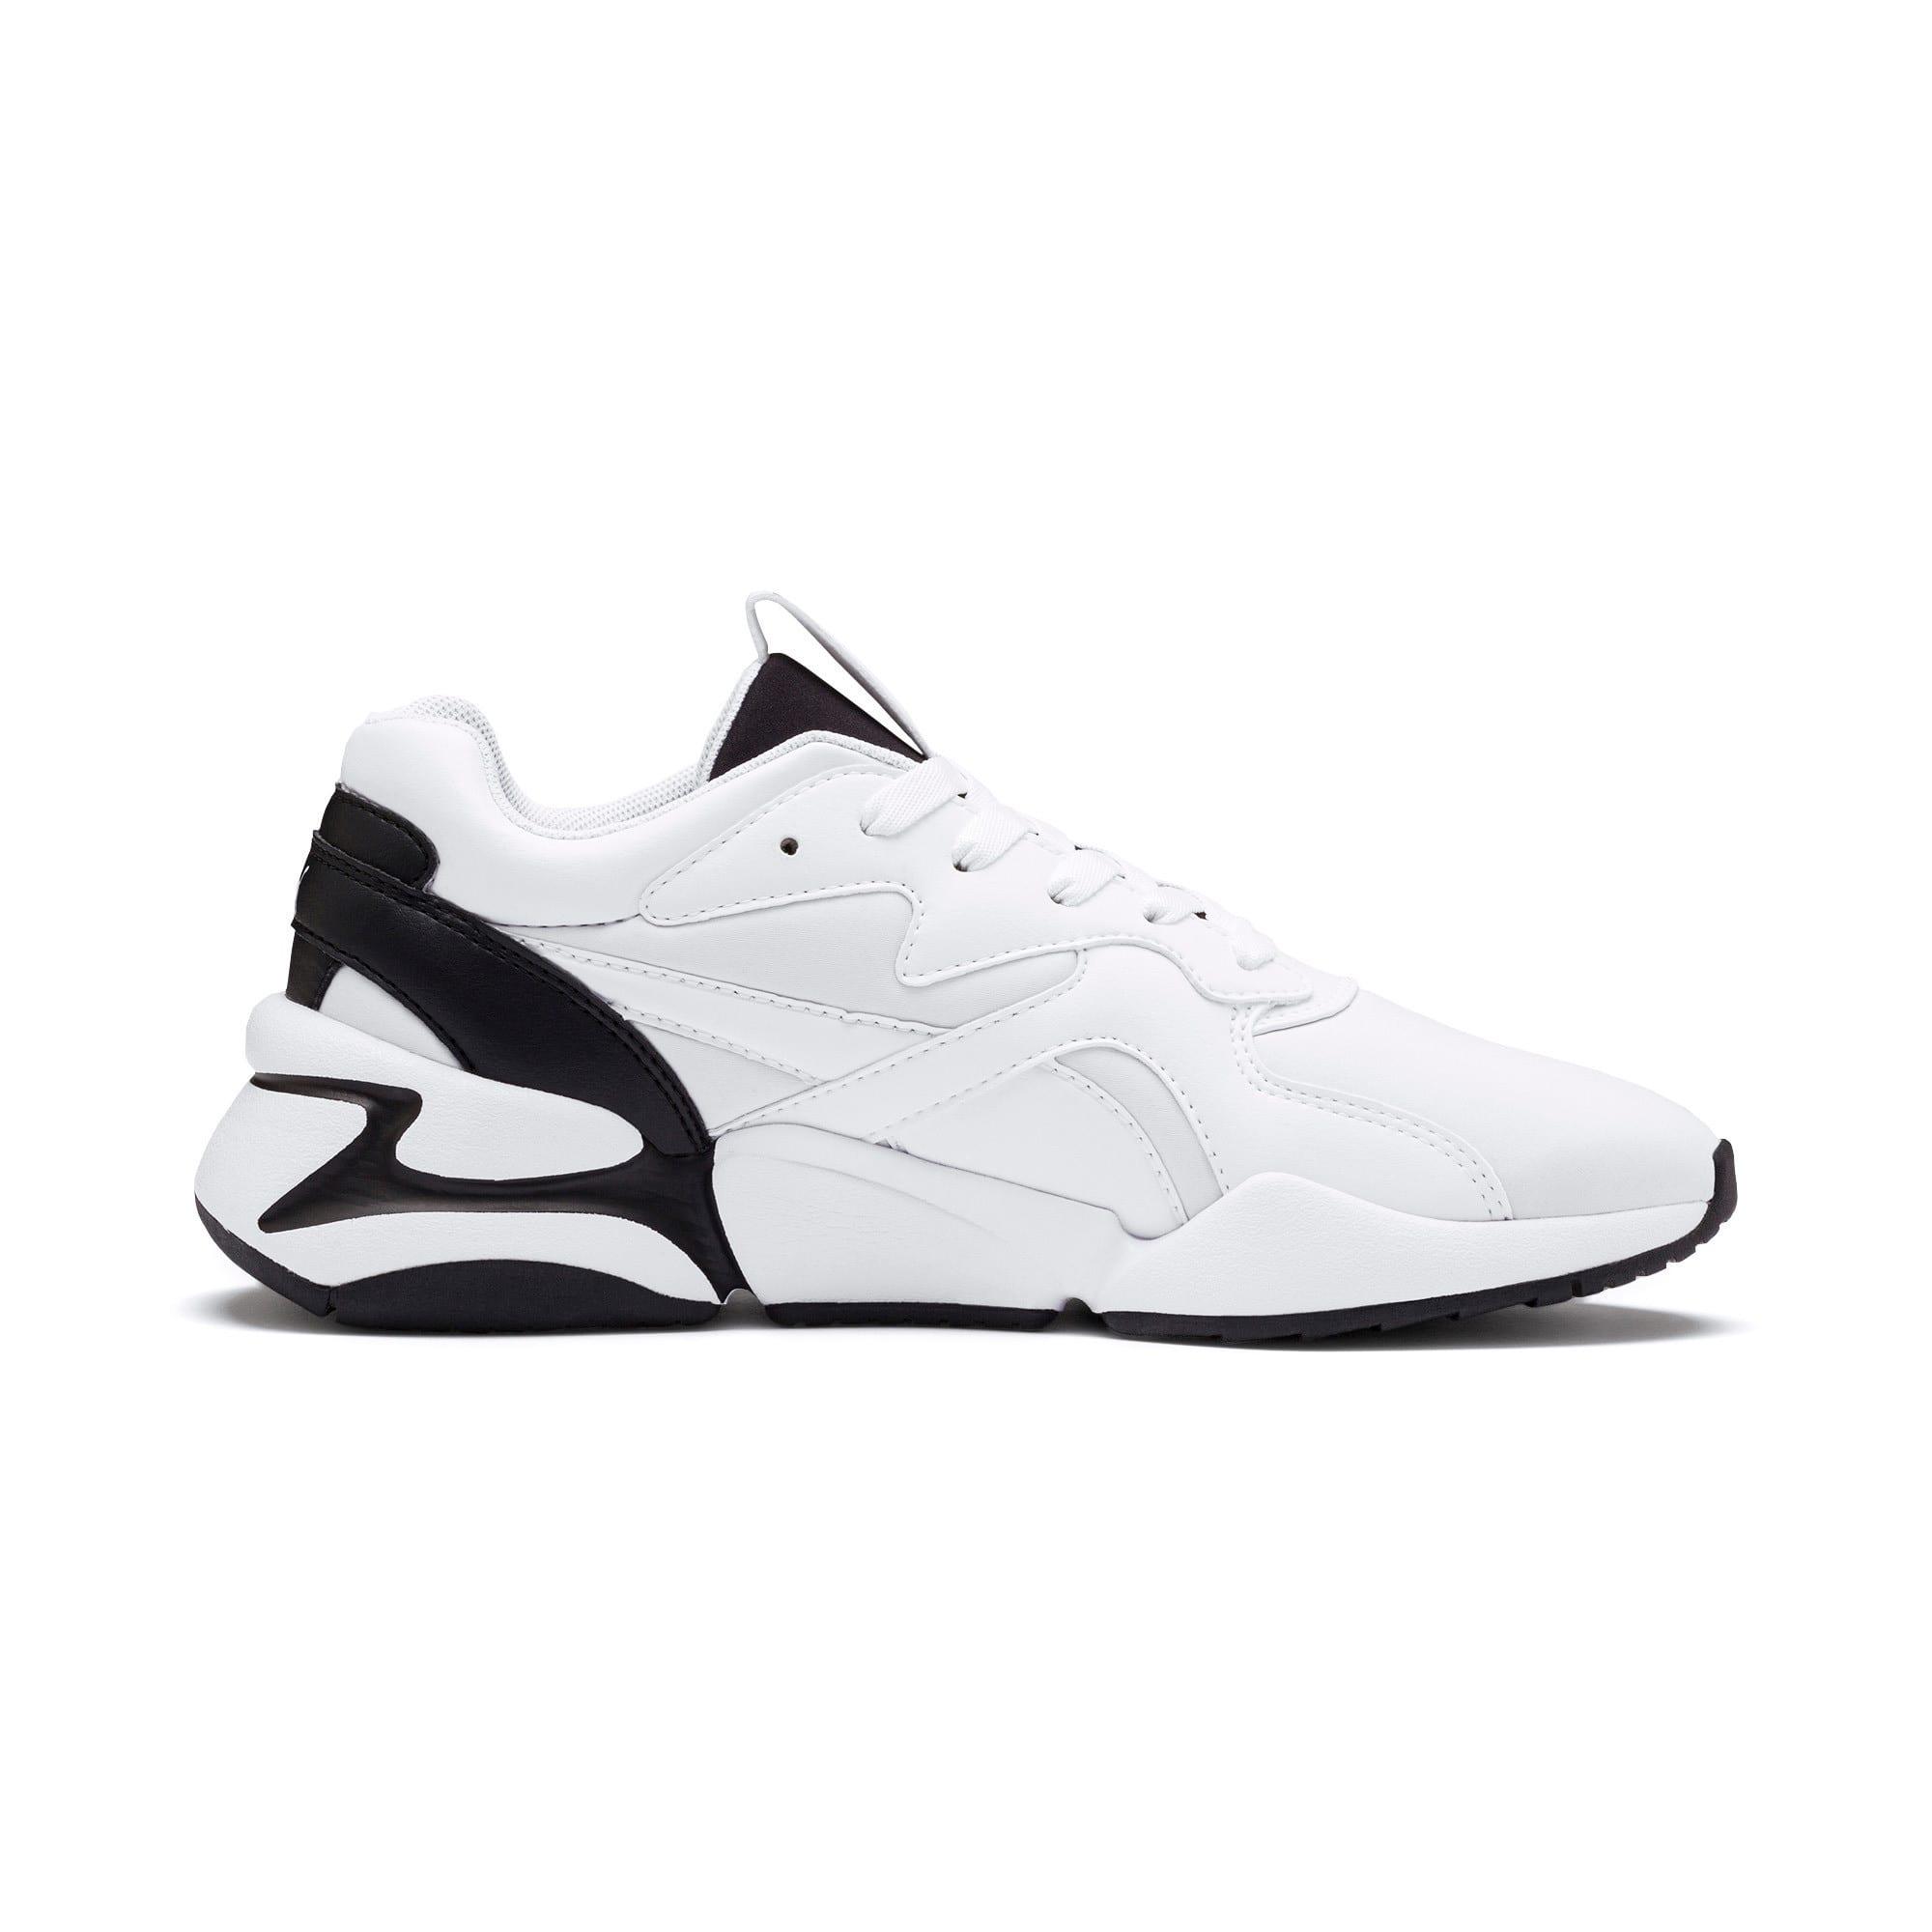 Thumbnail 8 of Nova Women's Sneakers, Puma White-Puma Black, medium